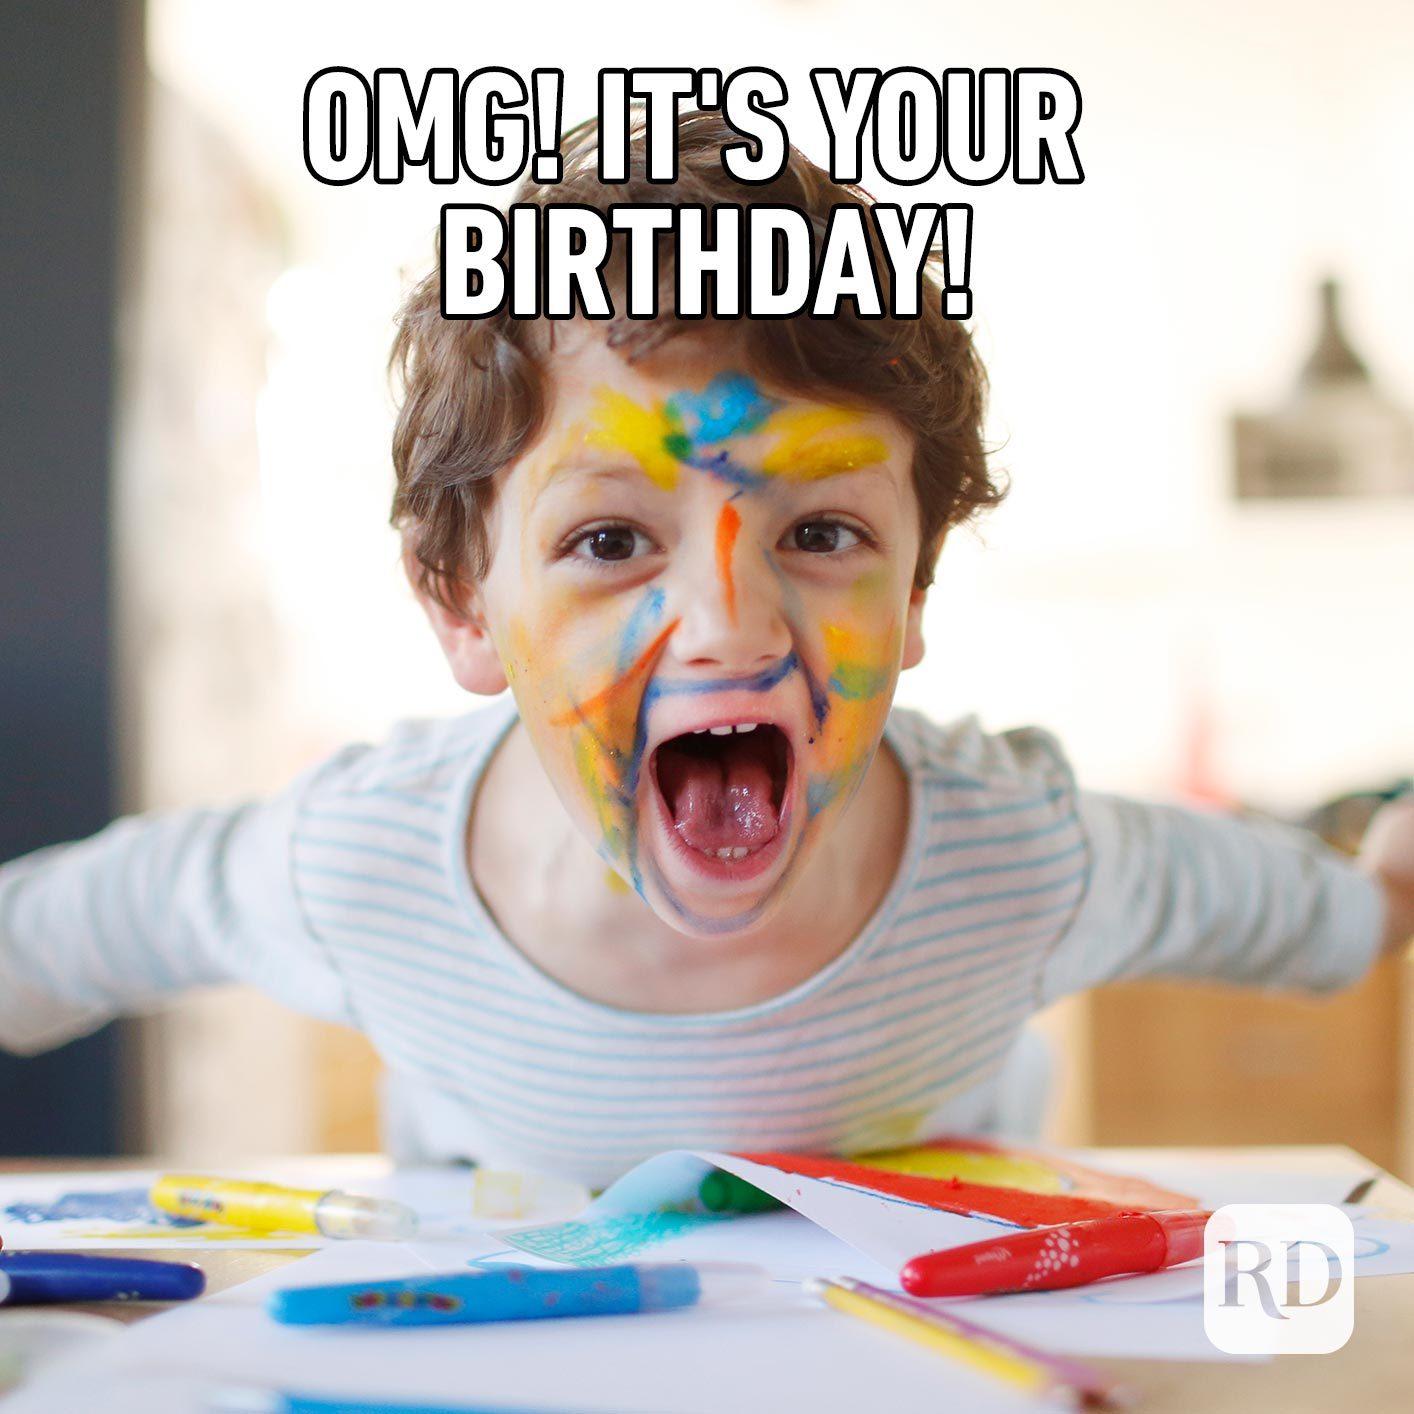 OMG! It's your birthday!